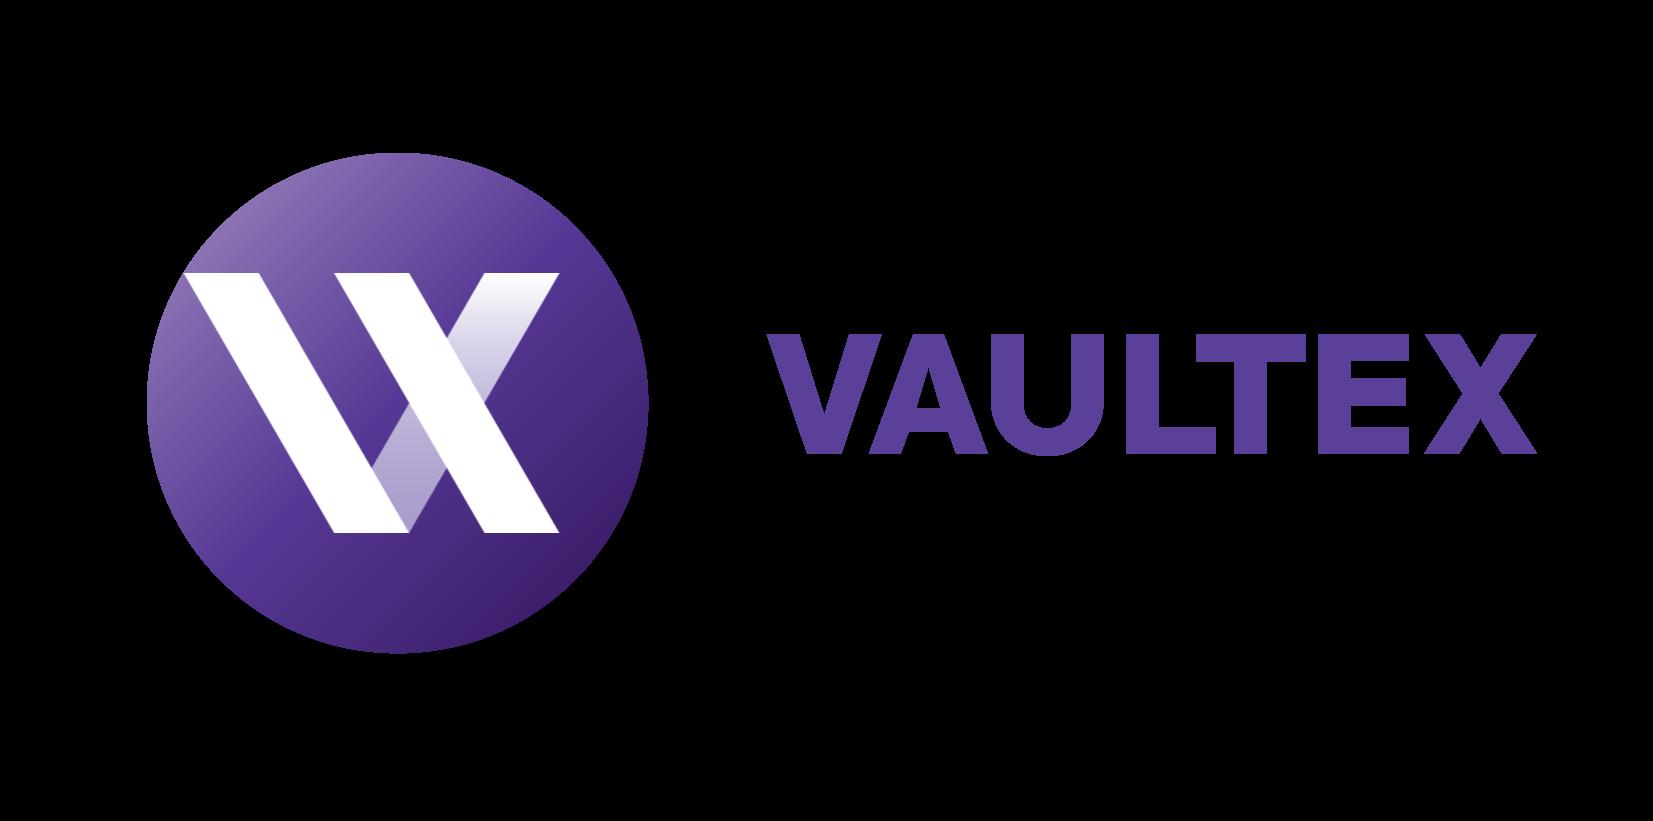 Vaultex logo